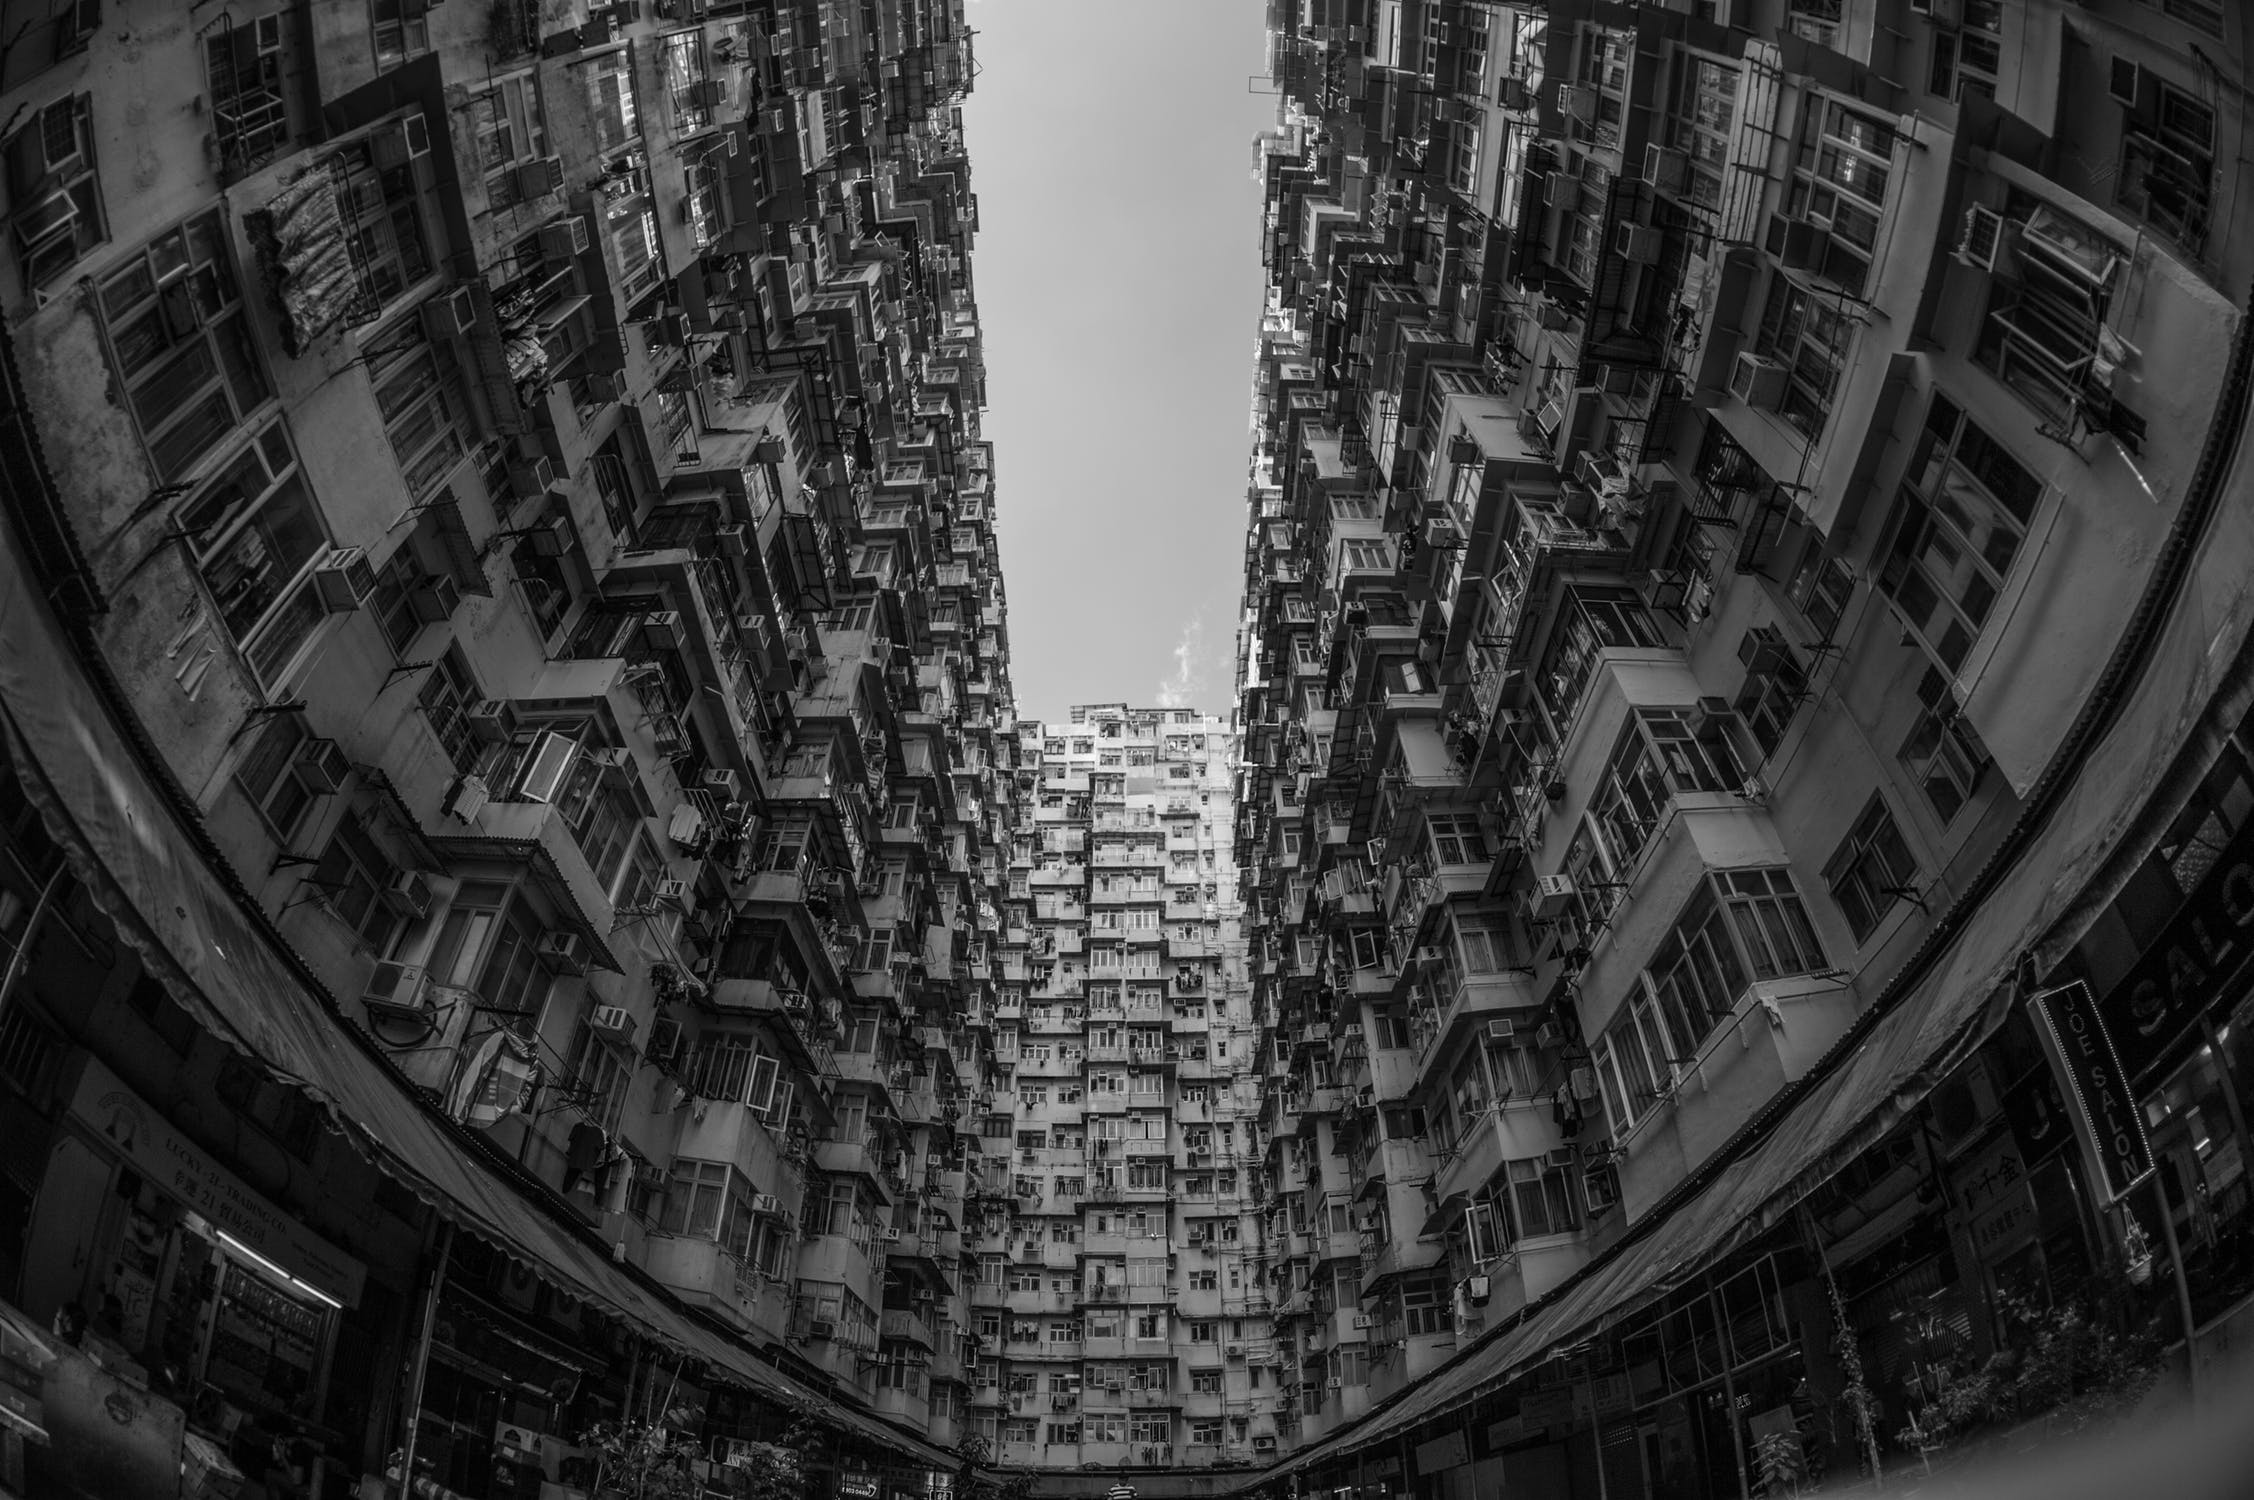 pexels-photo-584191.jpeg